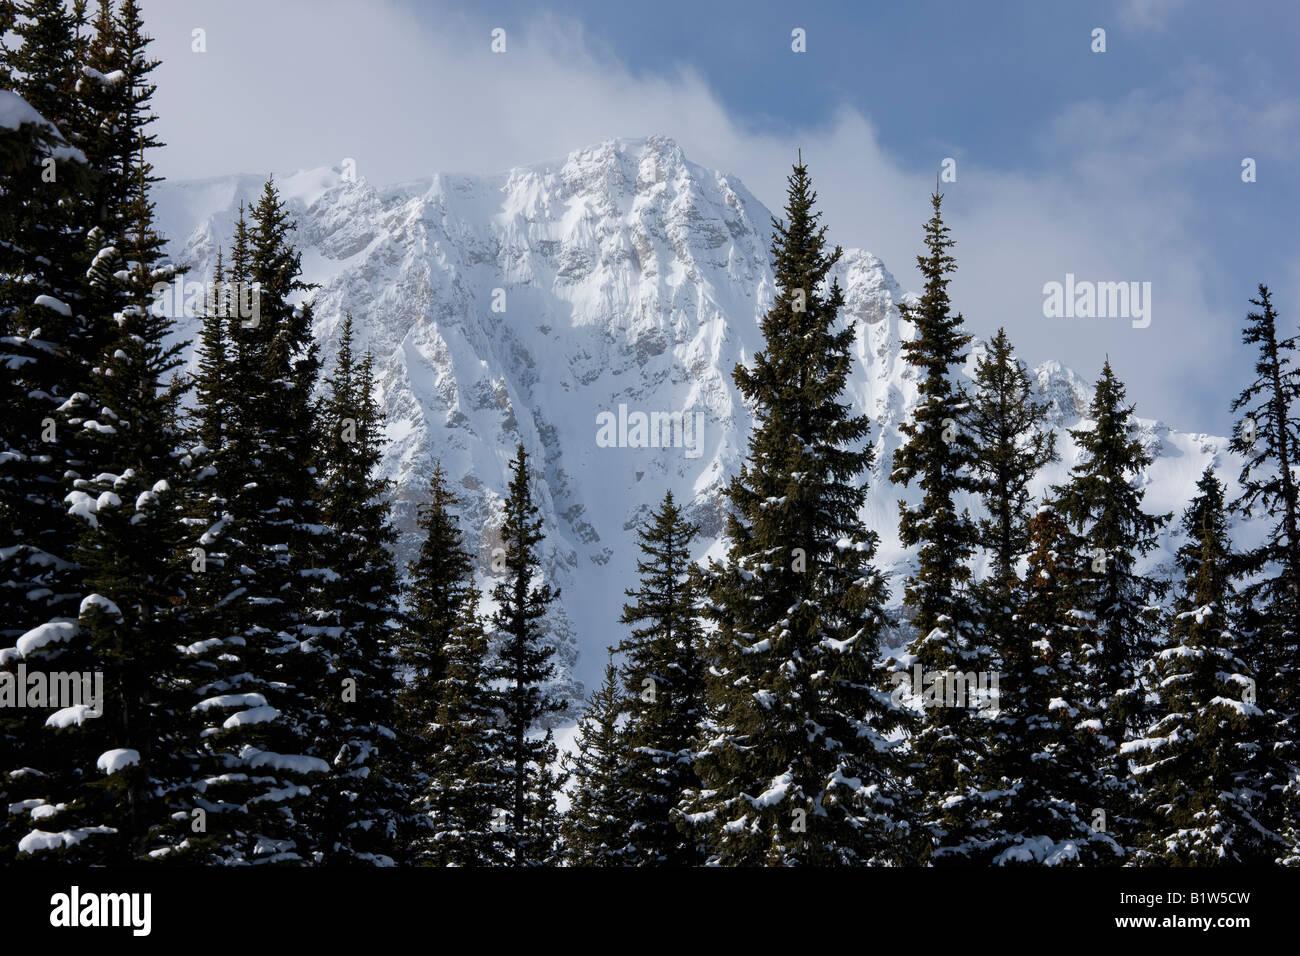 Kanada Alberta Banff National Park Icefield Parkway Berge über Kiefern gesehen Stockbild